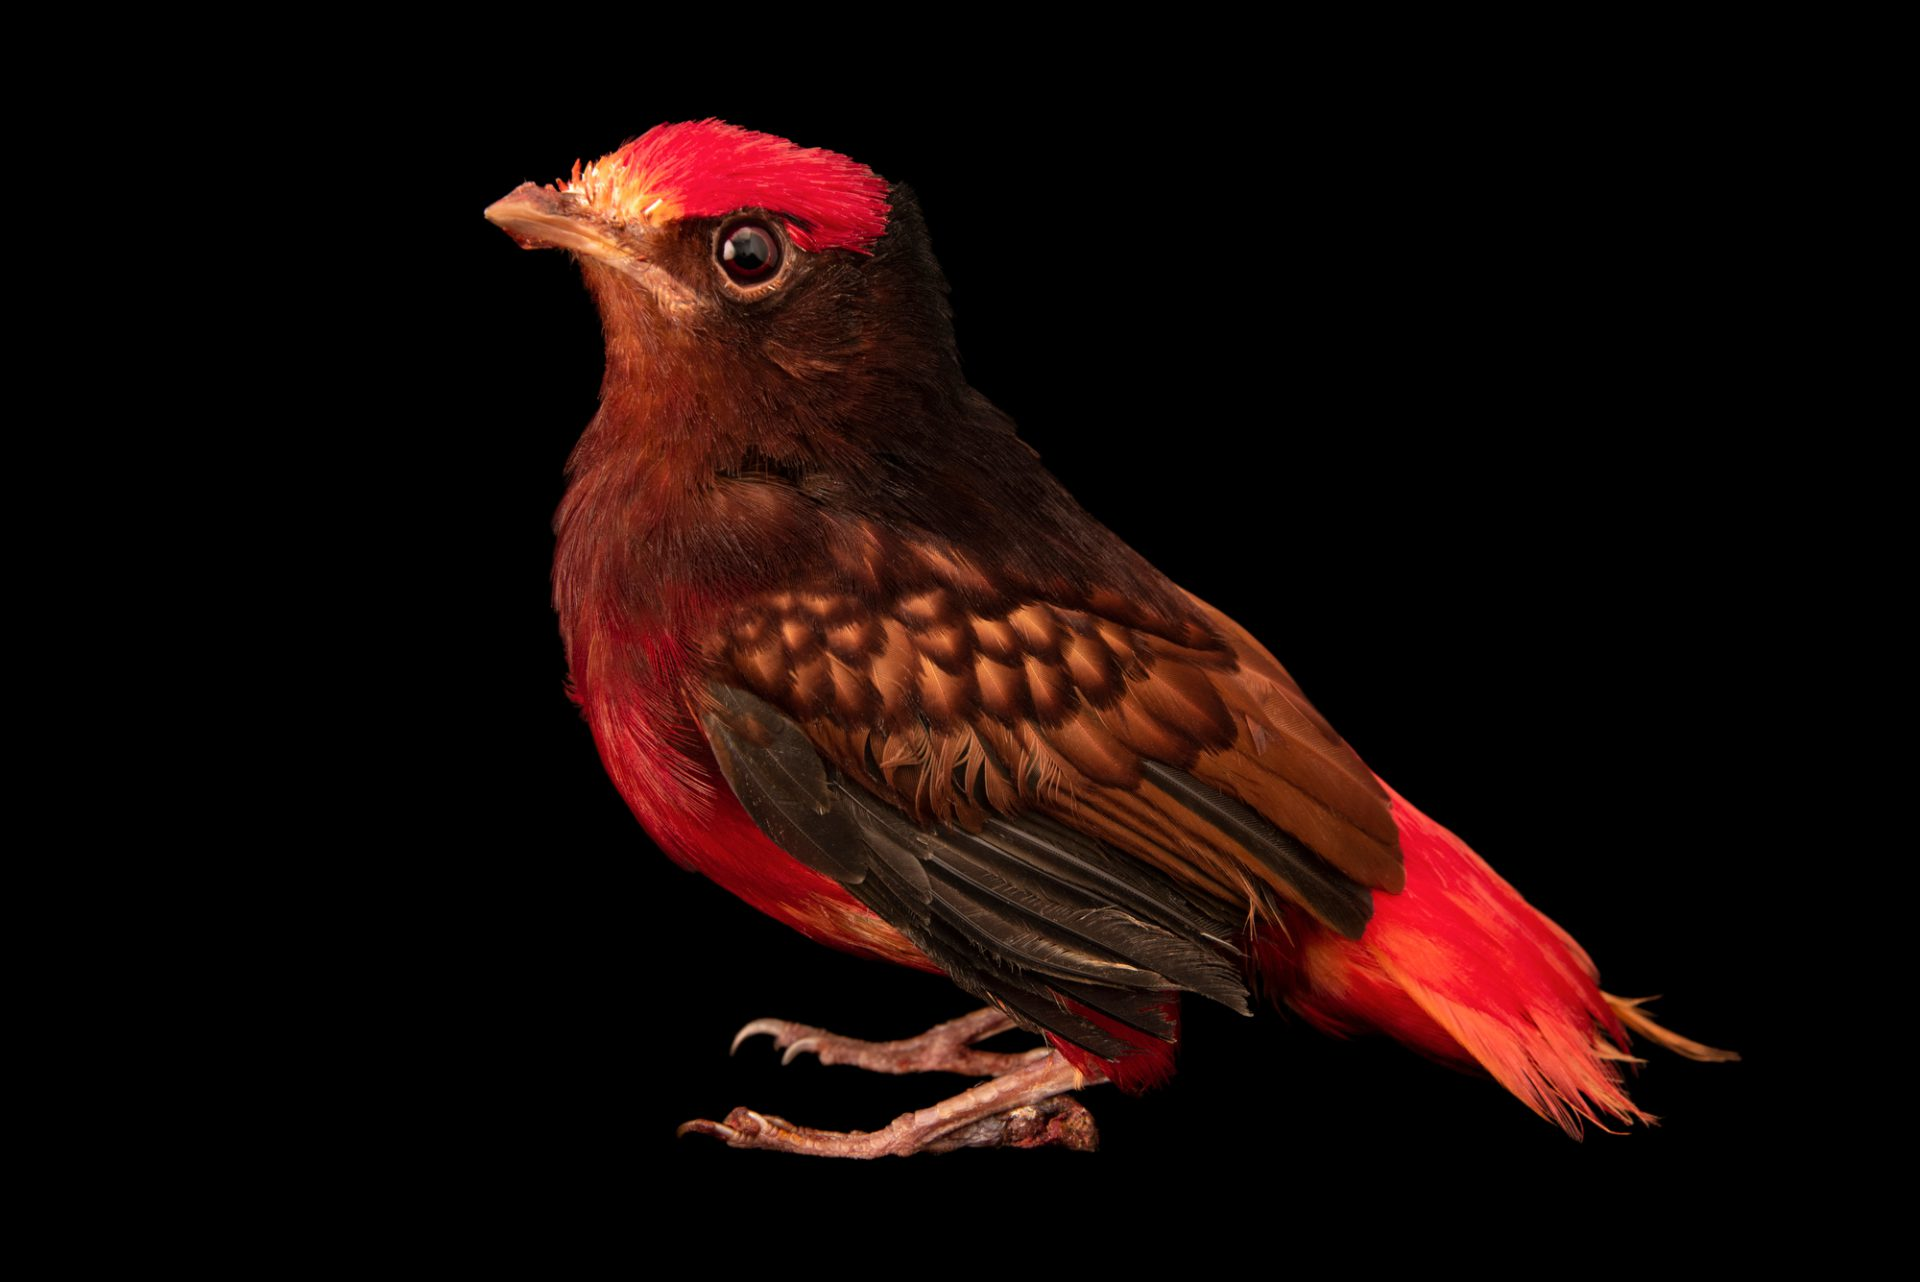 Photo: Guianan red-cotinga (Phoenicircus carnifex) at the Dallas World Aquarium.